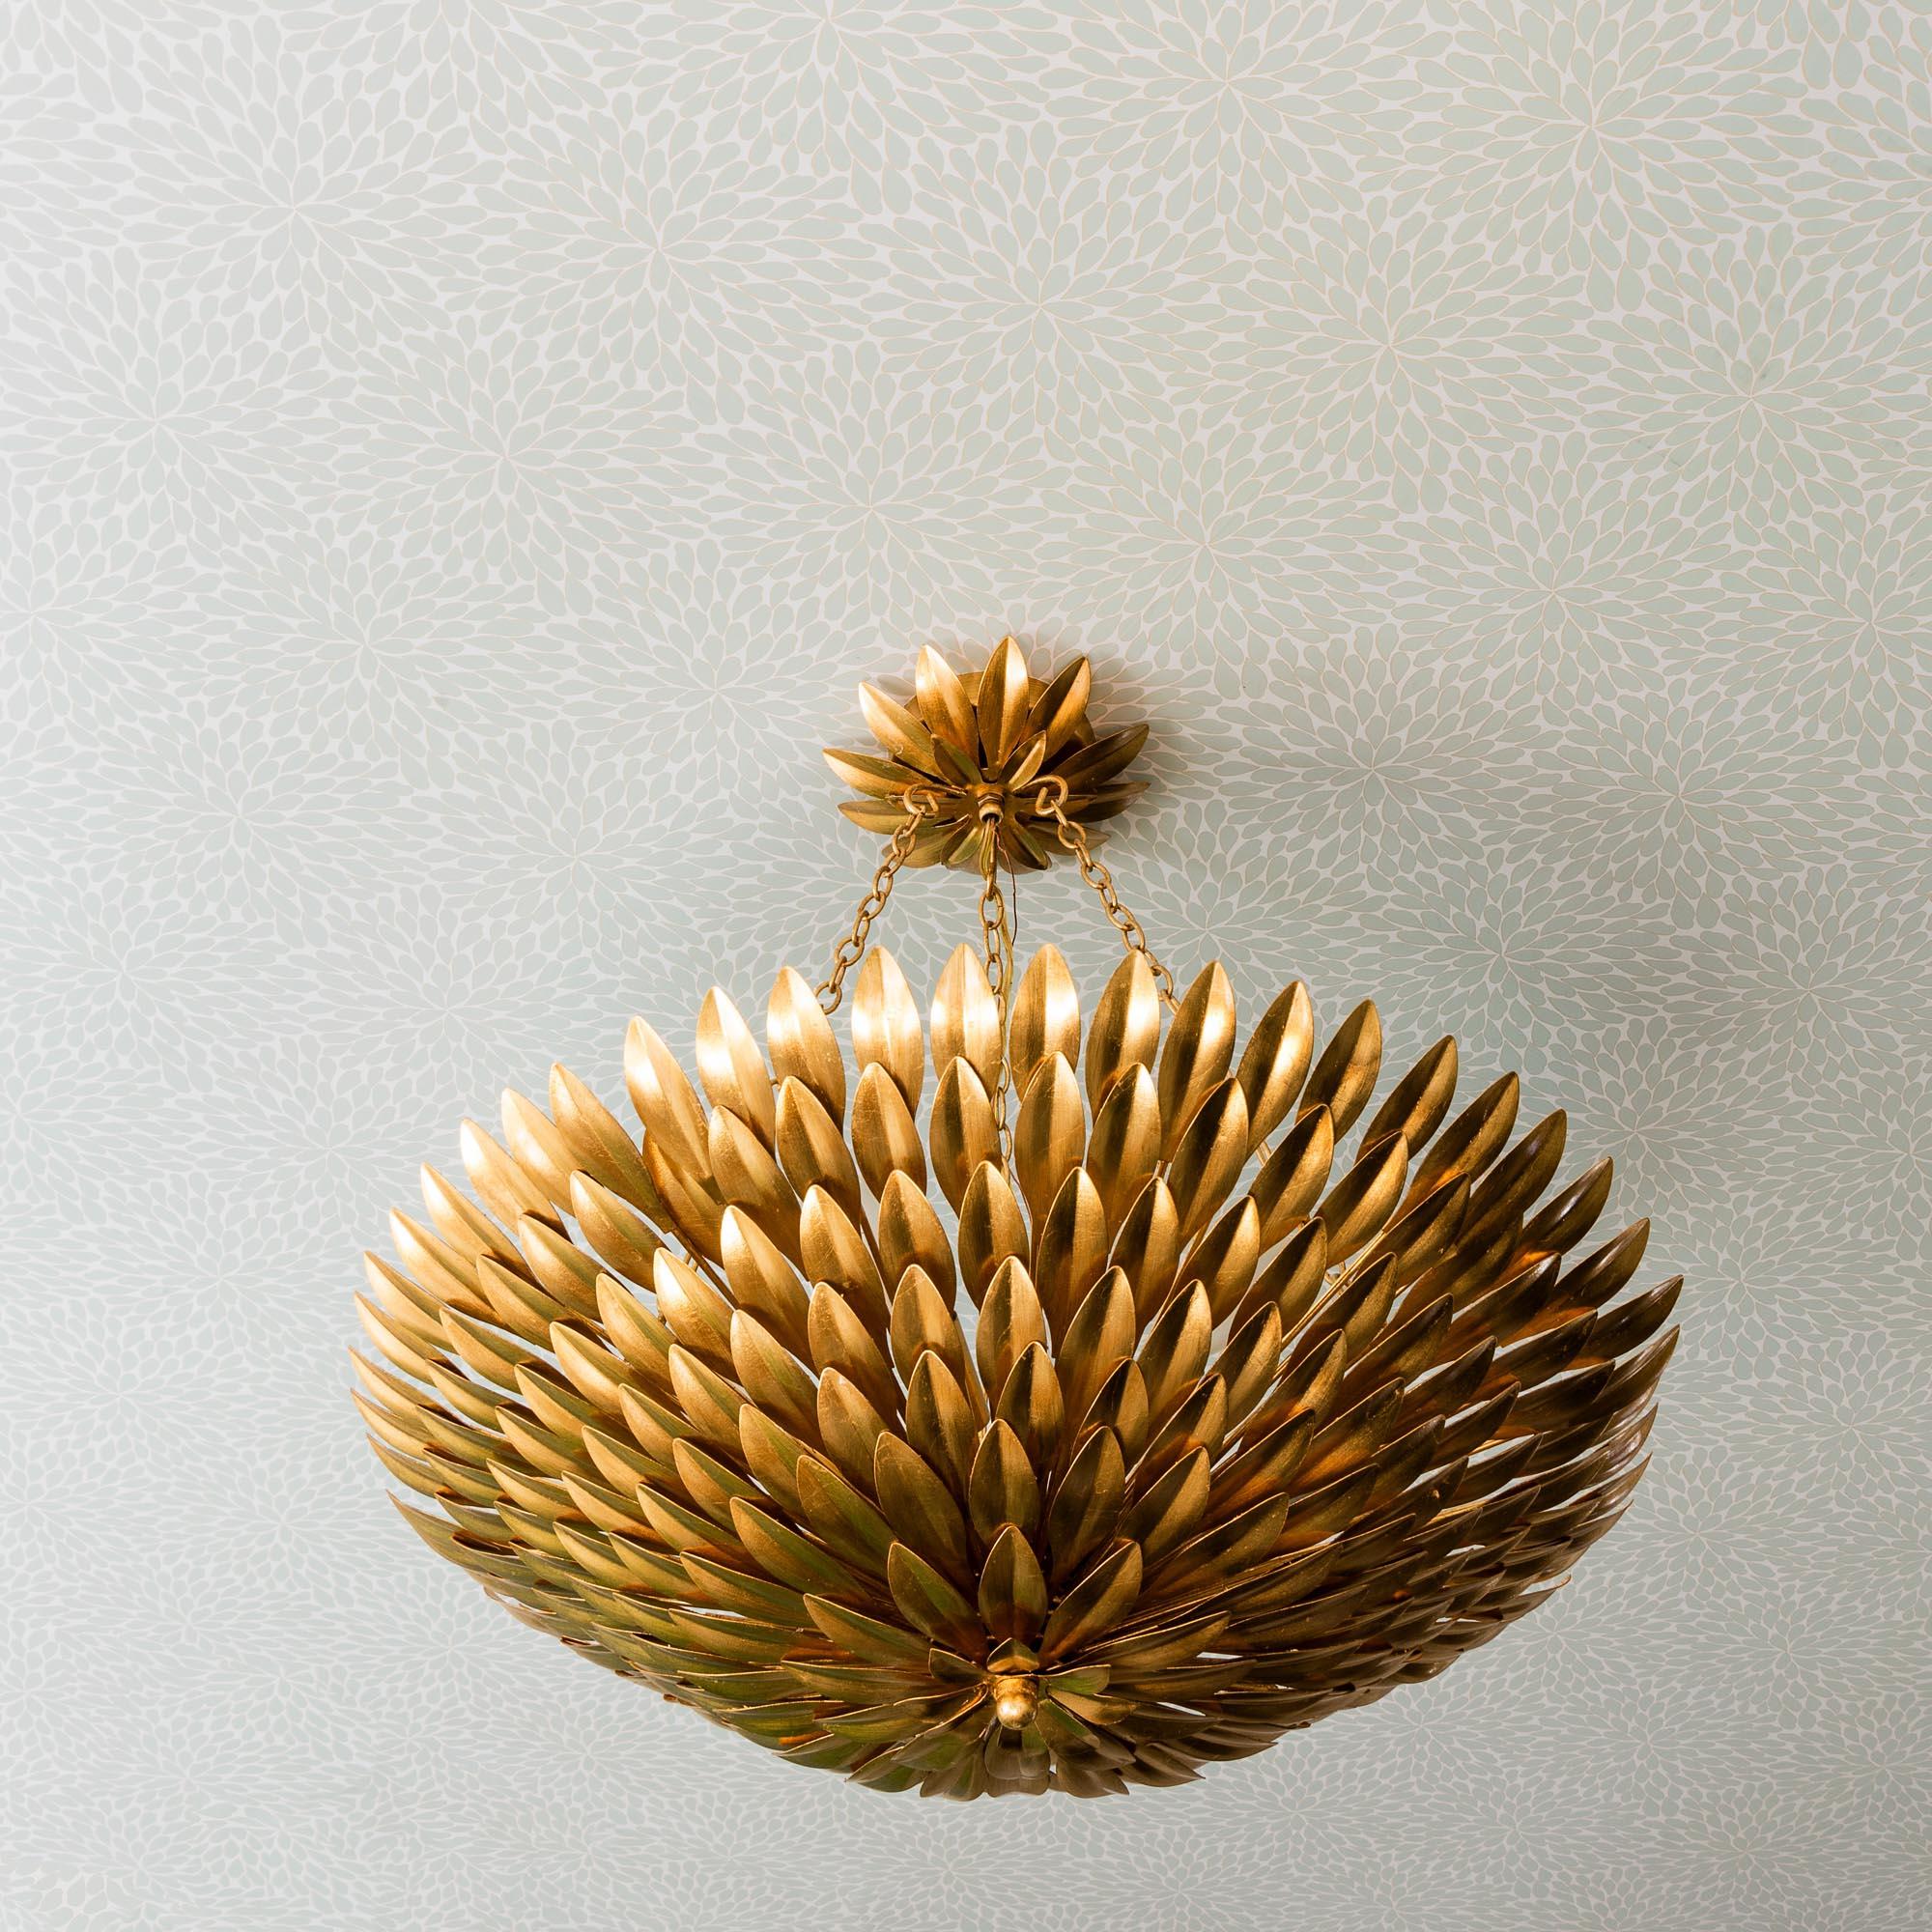 Boston ceiling light fixture design by Dane Austin Design